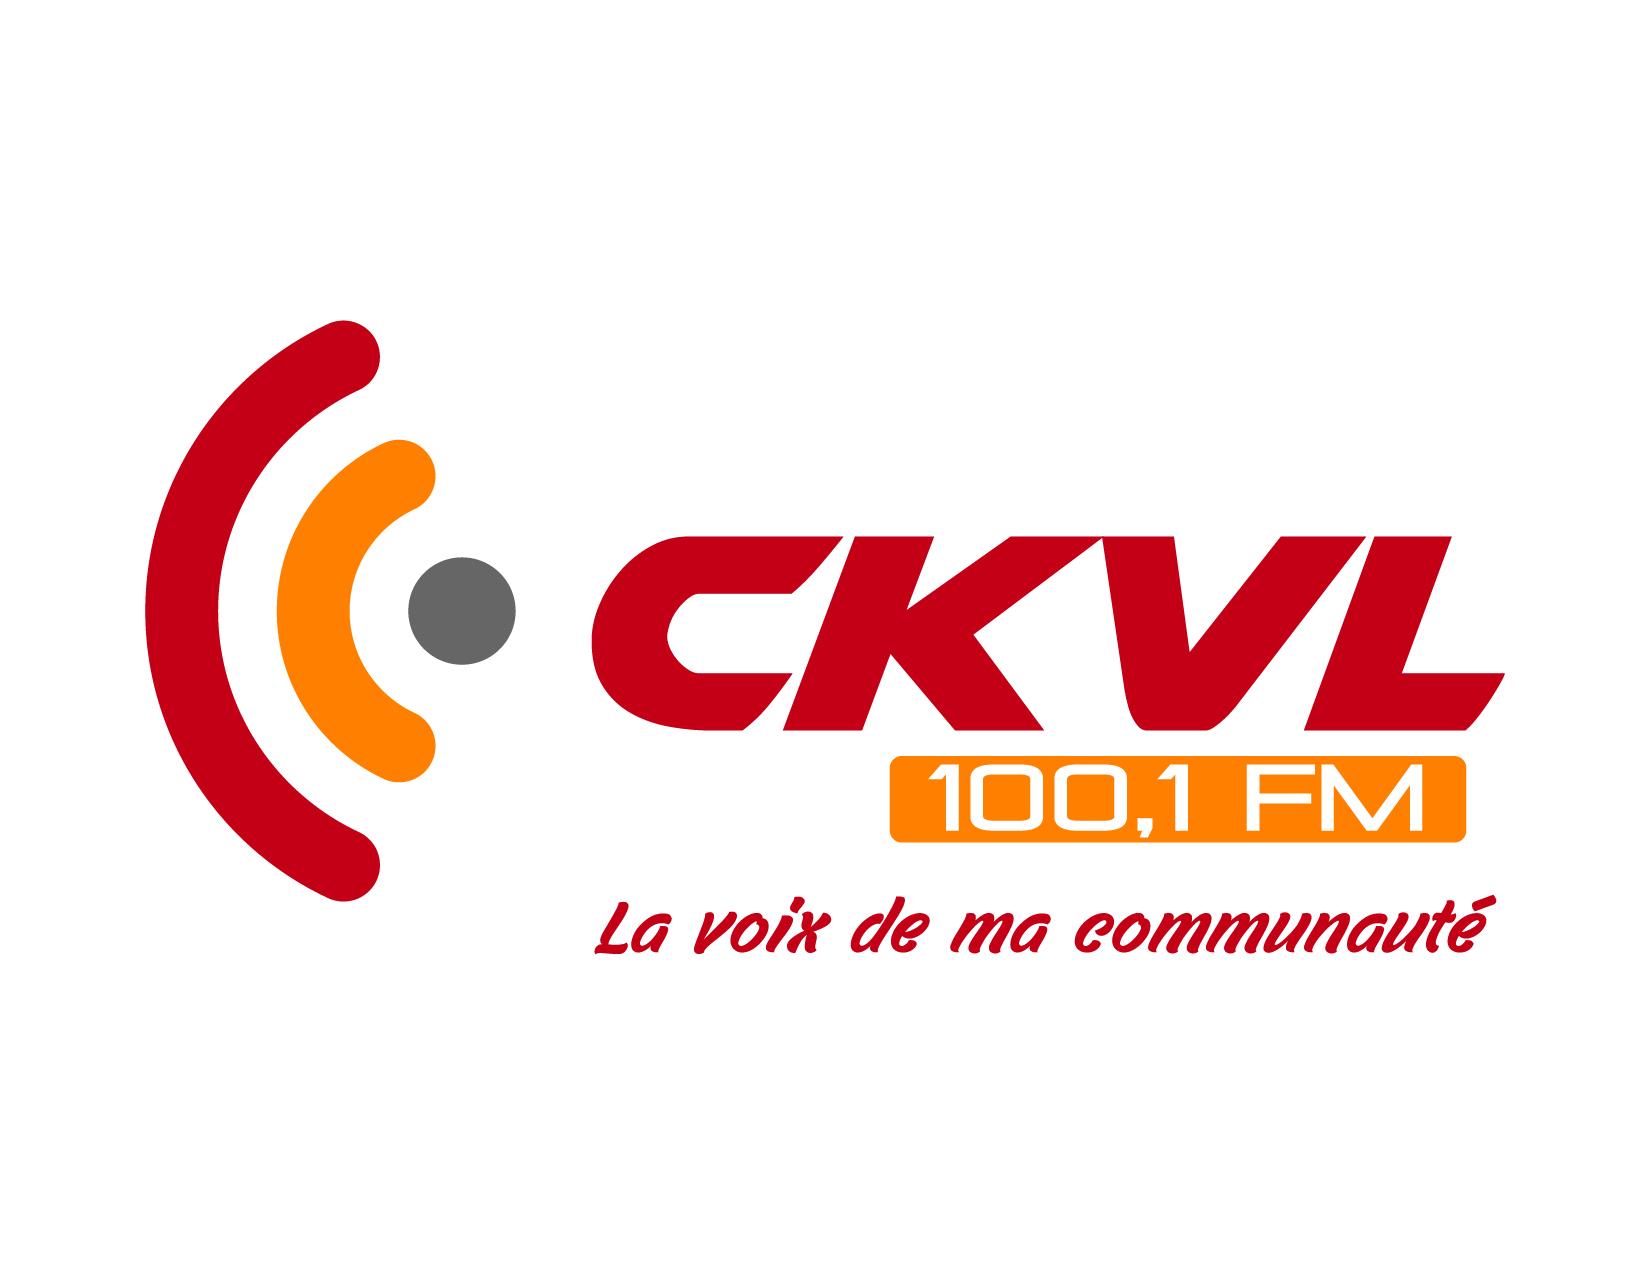 ckvl-100-1fm